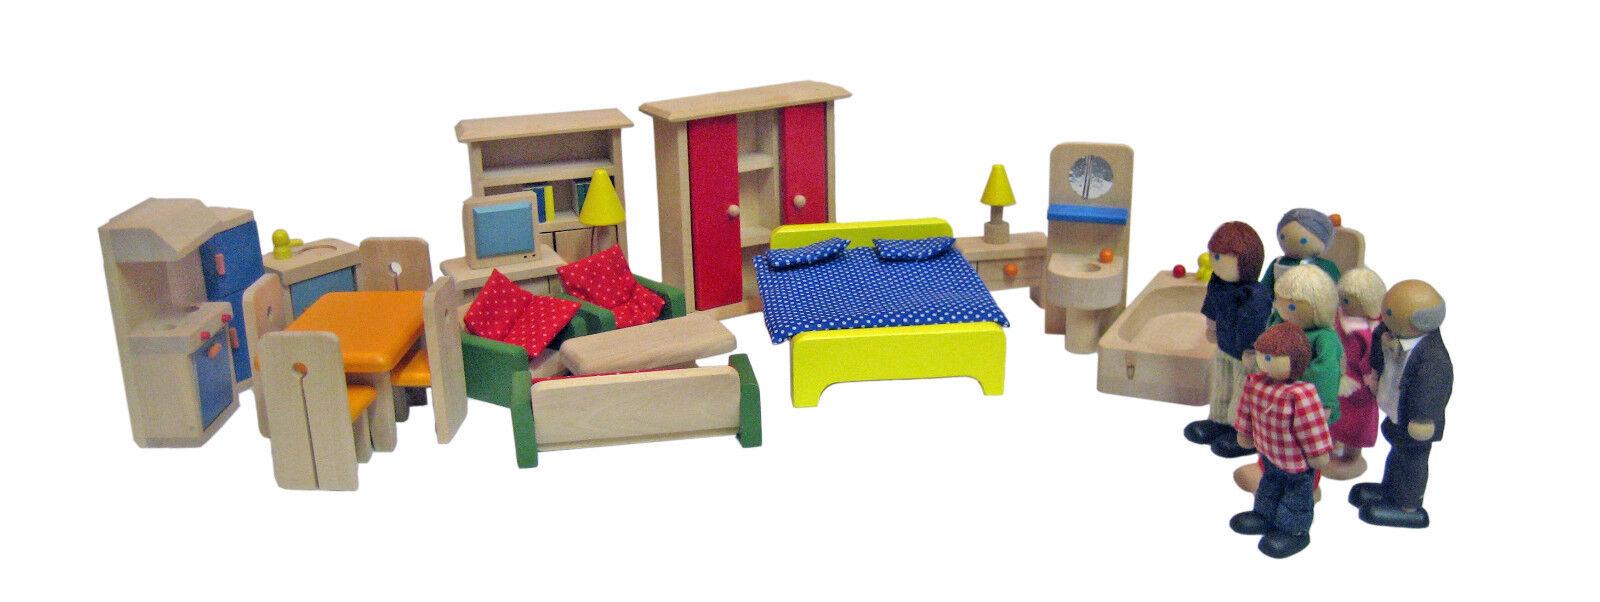 Casa-set, 34 piezas + biegepuppenfamilie